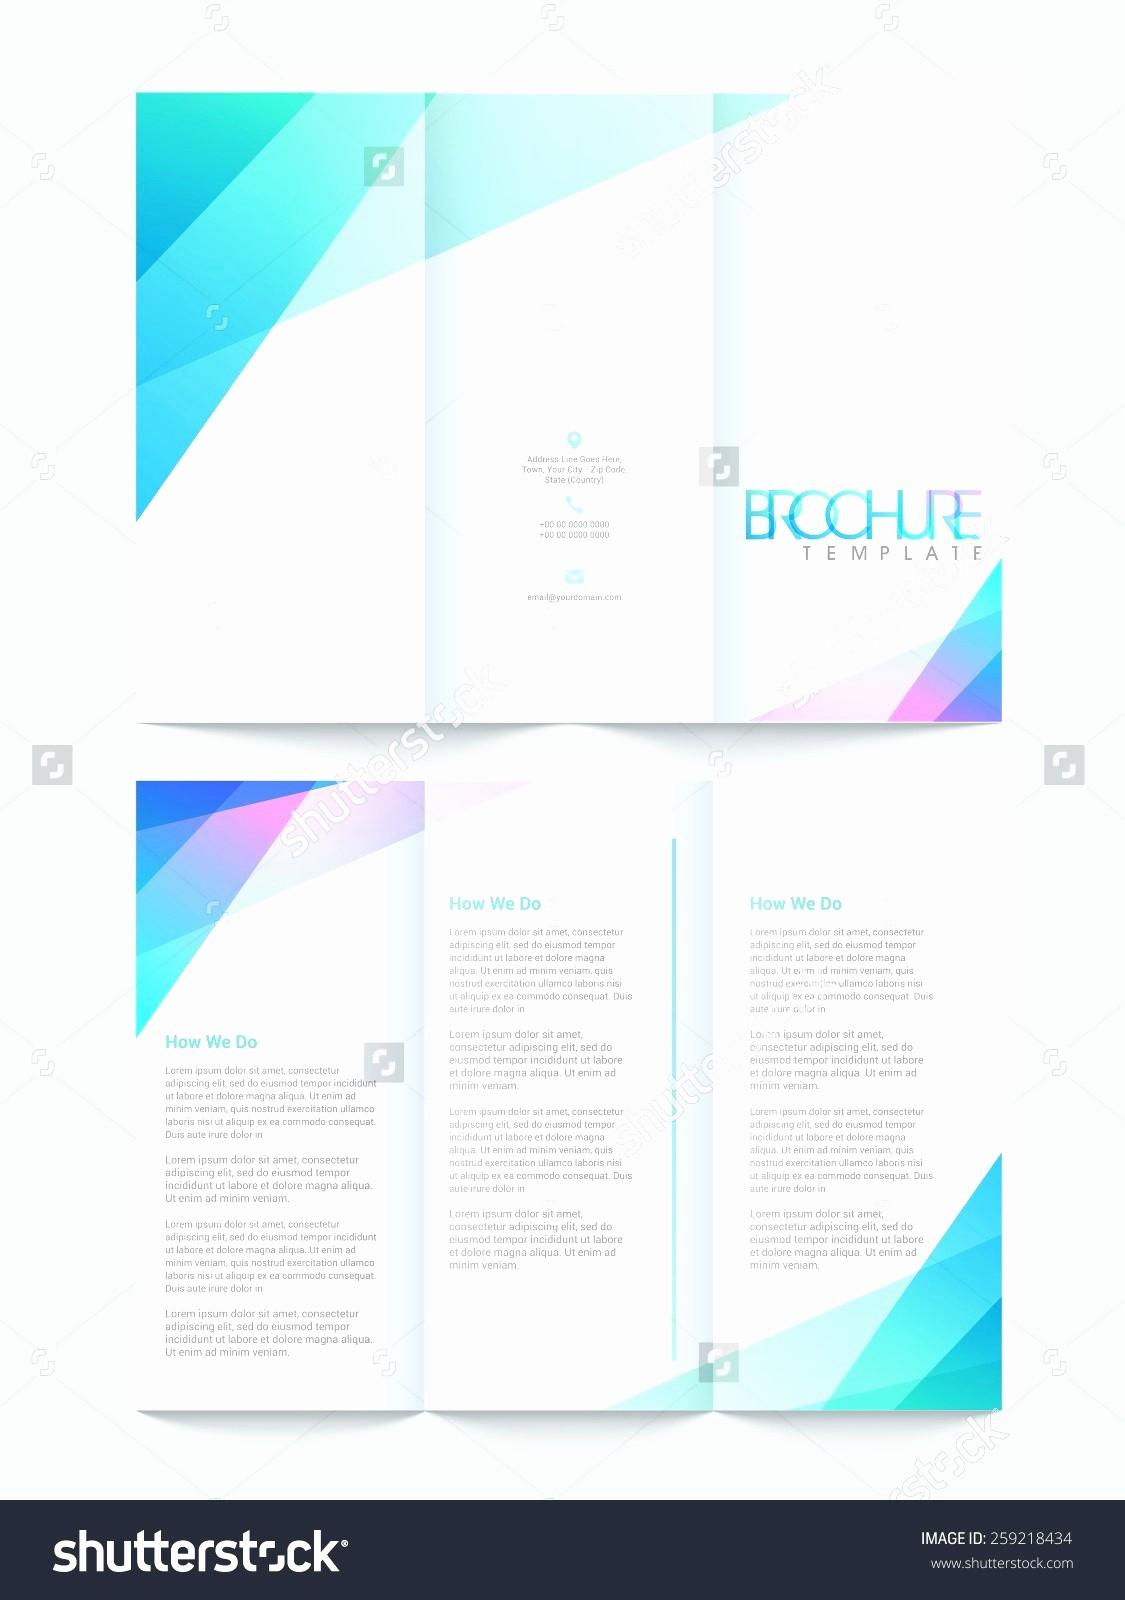 Microsoft Word Tri Fold Template New 50 Inspirational Free Tri Fold Brochure Template Word